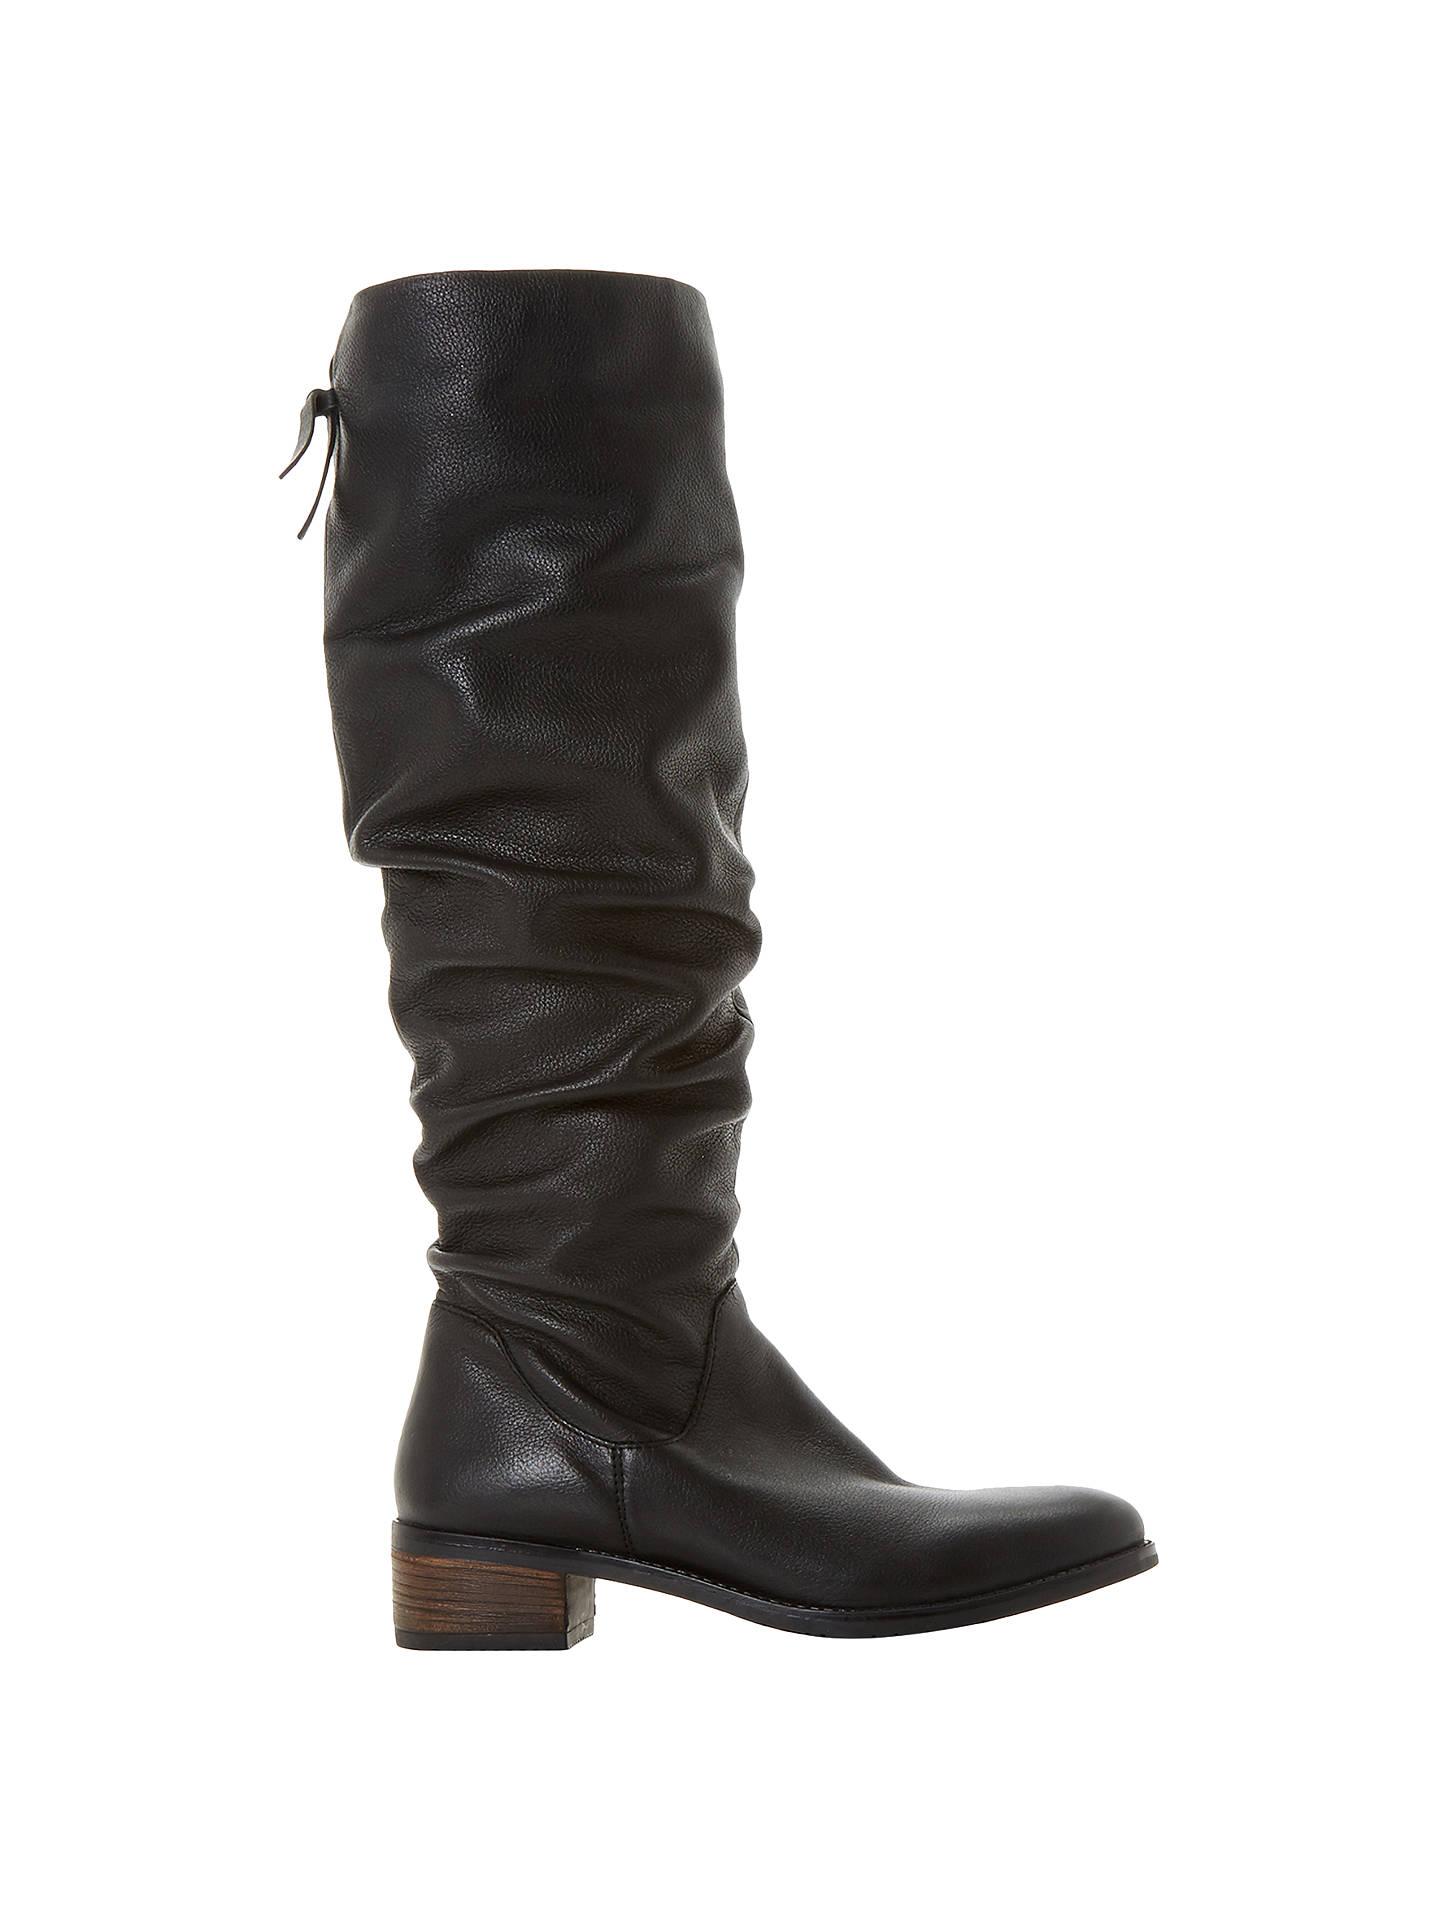 18b67fe2e45 Dune Tabatha Knee High Slouch Boots at John Lewis & Partners